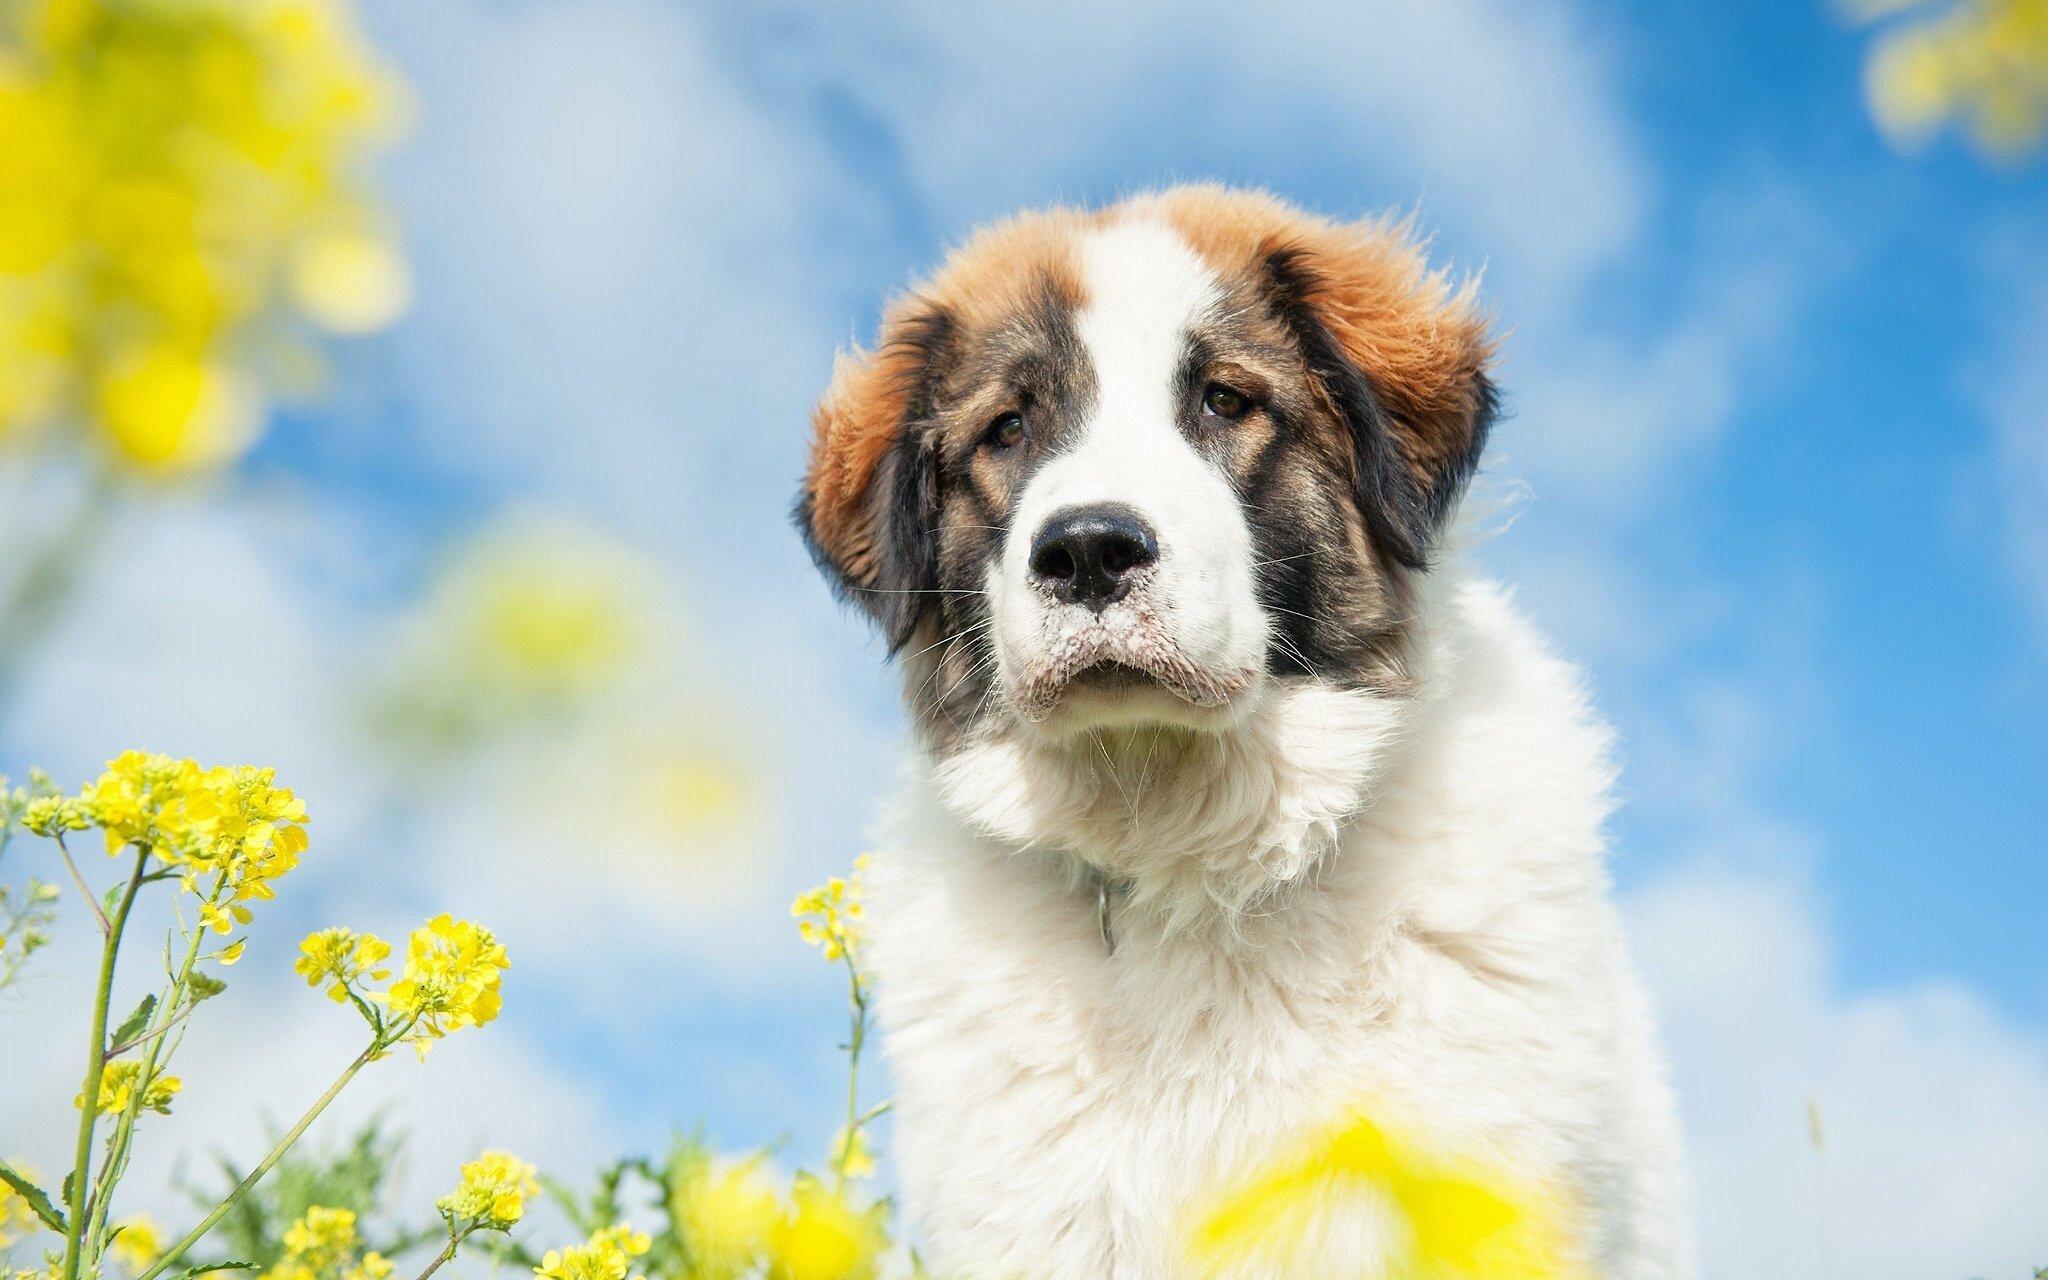 st bernard dog dog rape flowers sky baby puppy wallpaper | 2048x1280